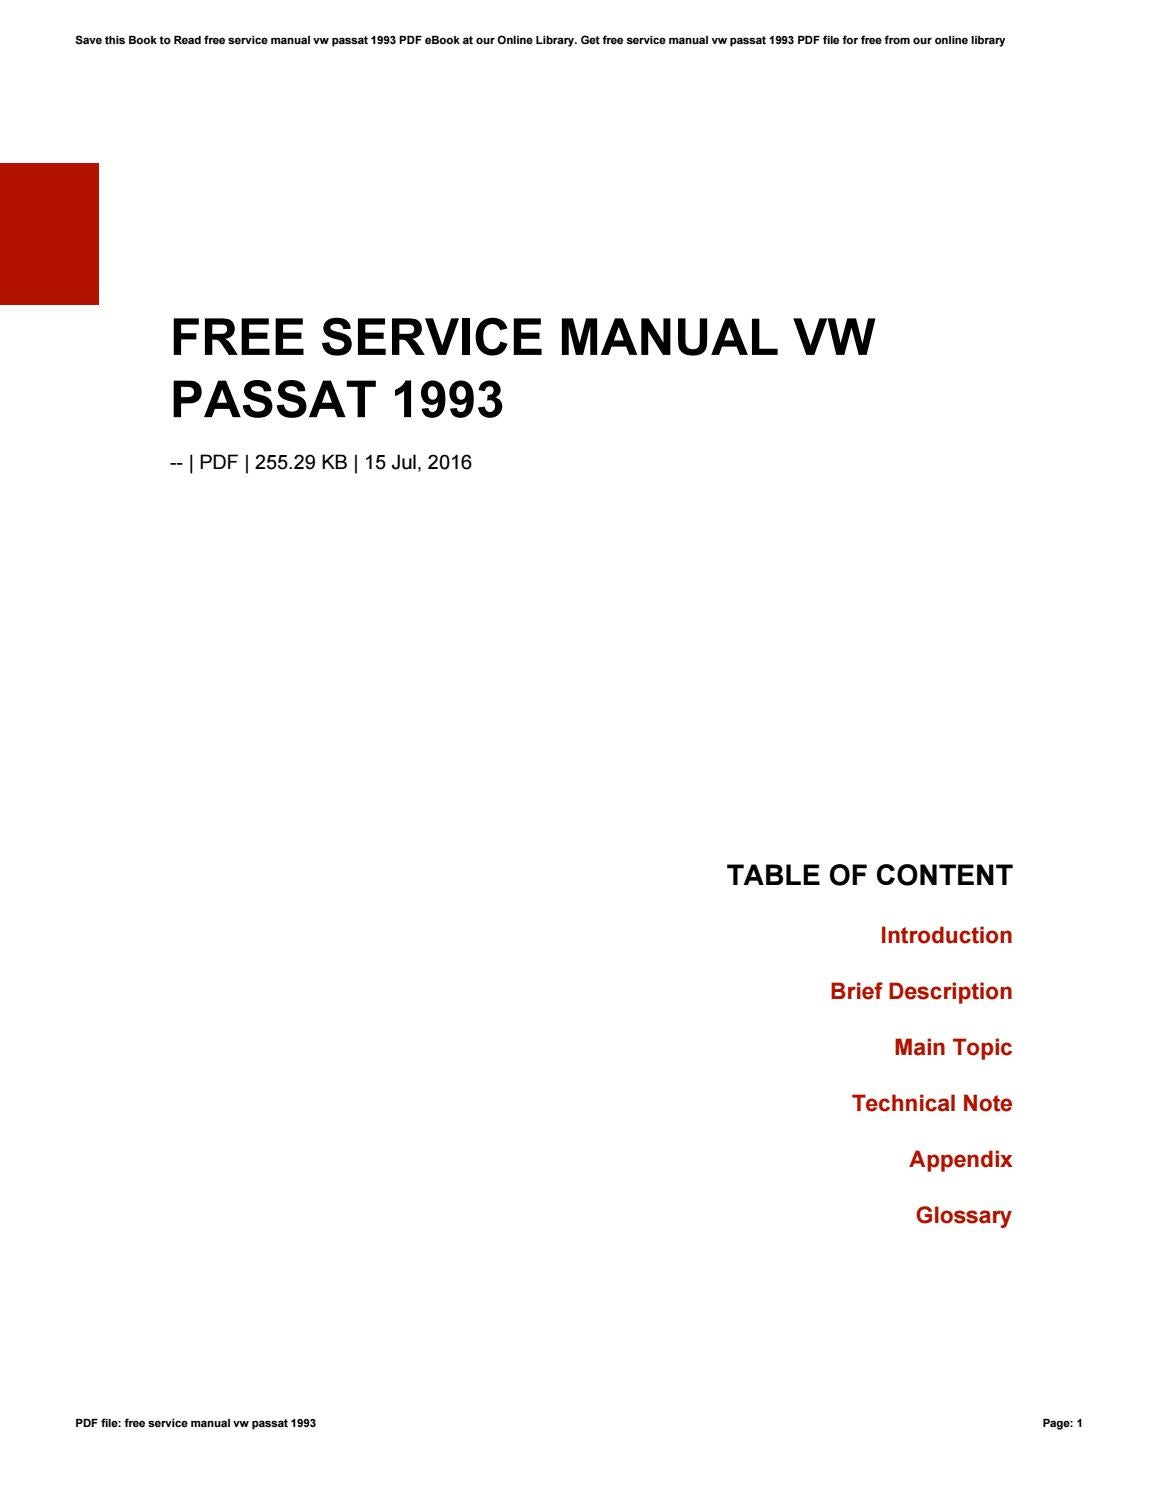 Passat B5 Service Manual Download